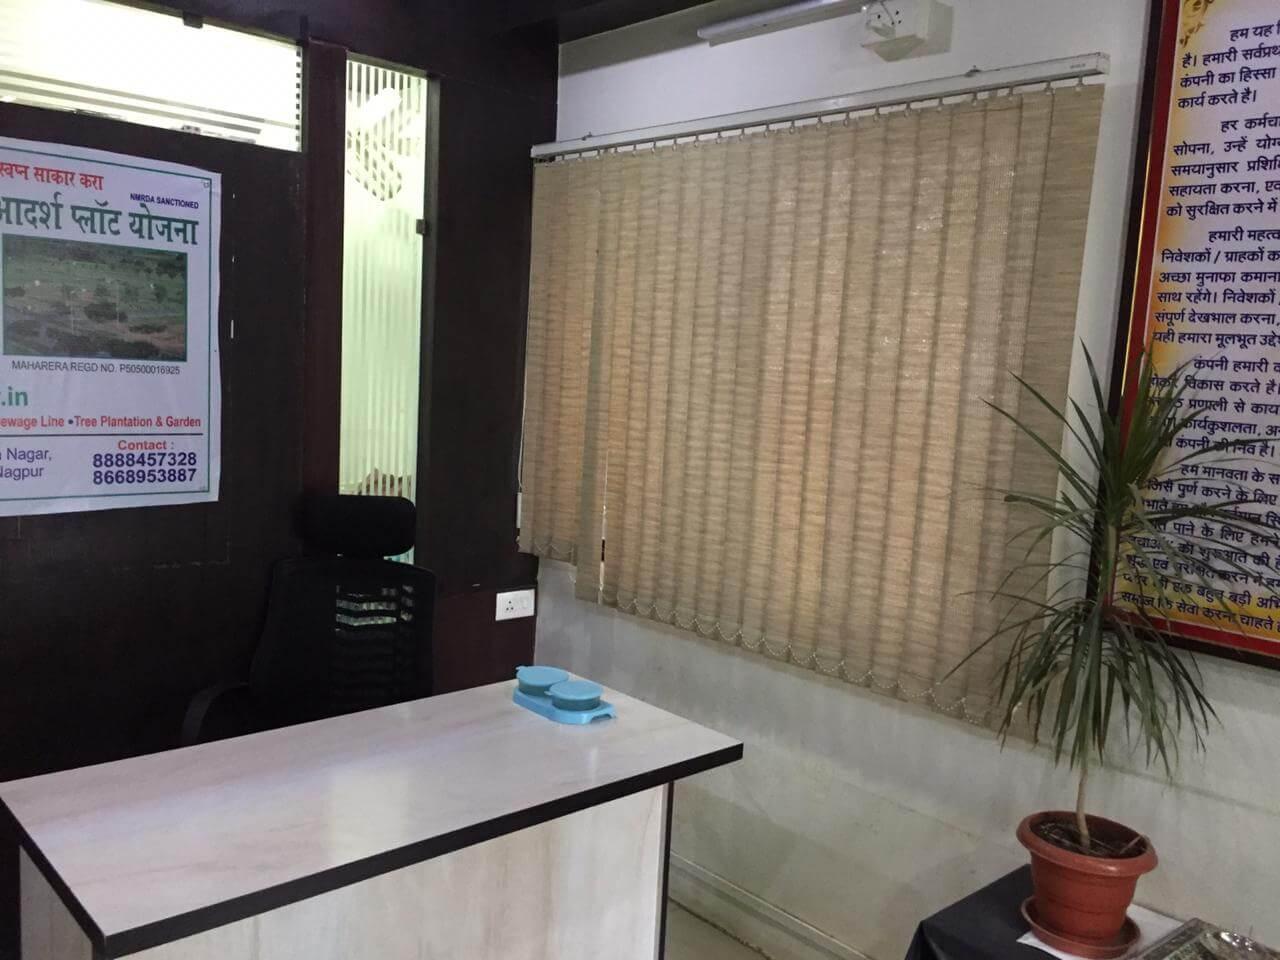 Office Space for Rent 1100 Sq. Feet at Nagpur, Narendra Nagar